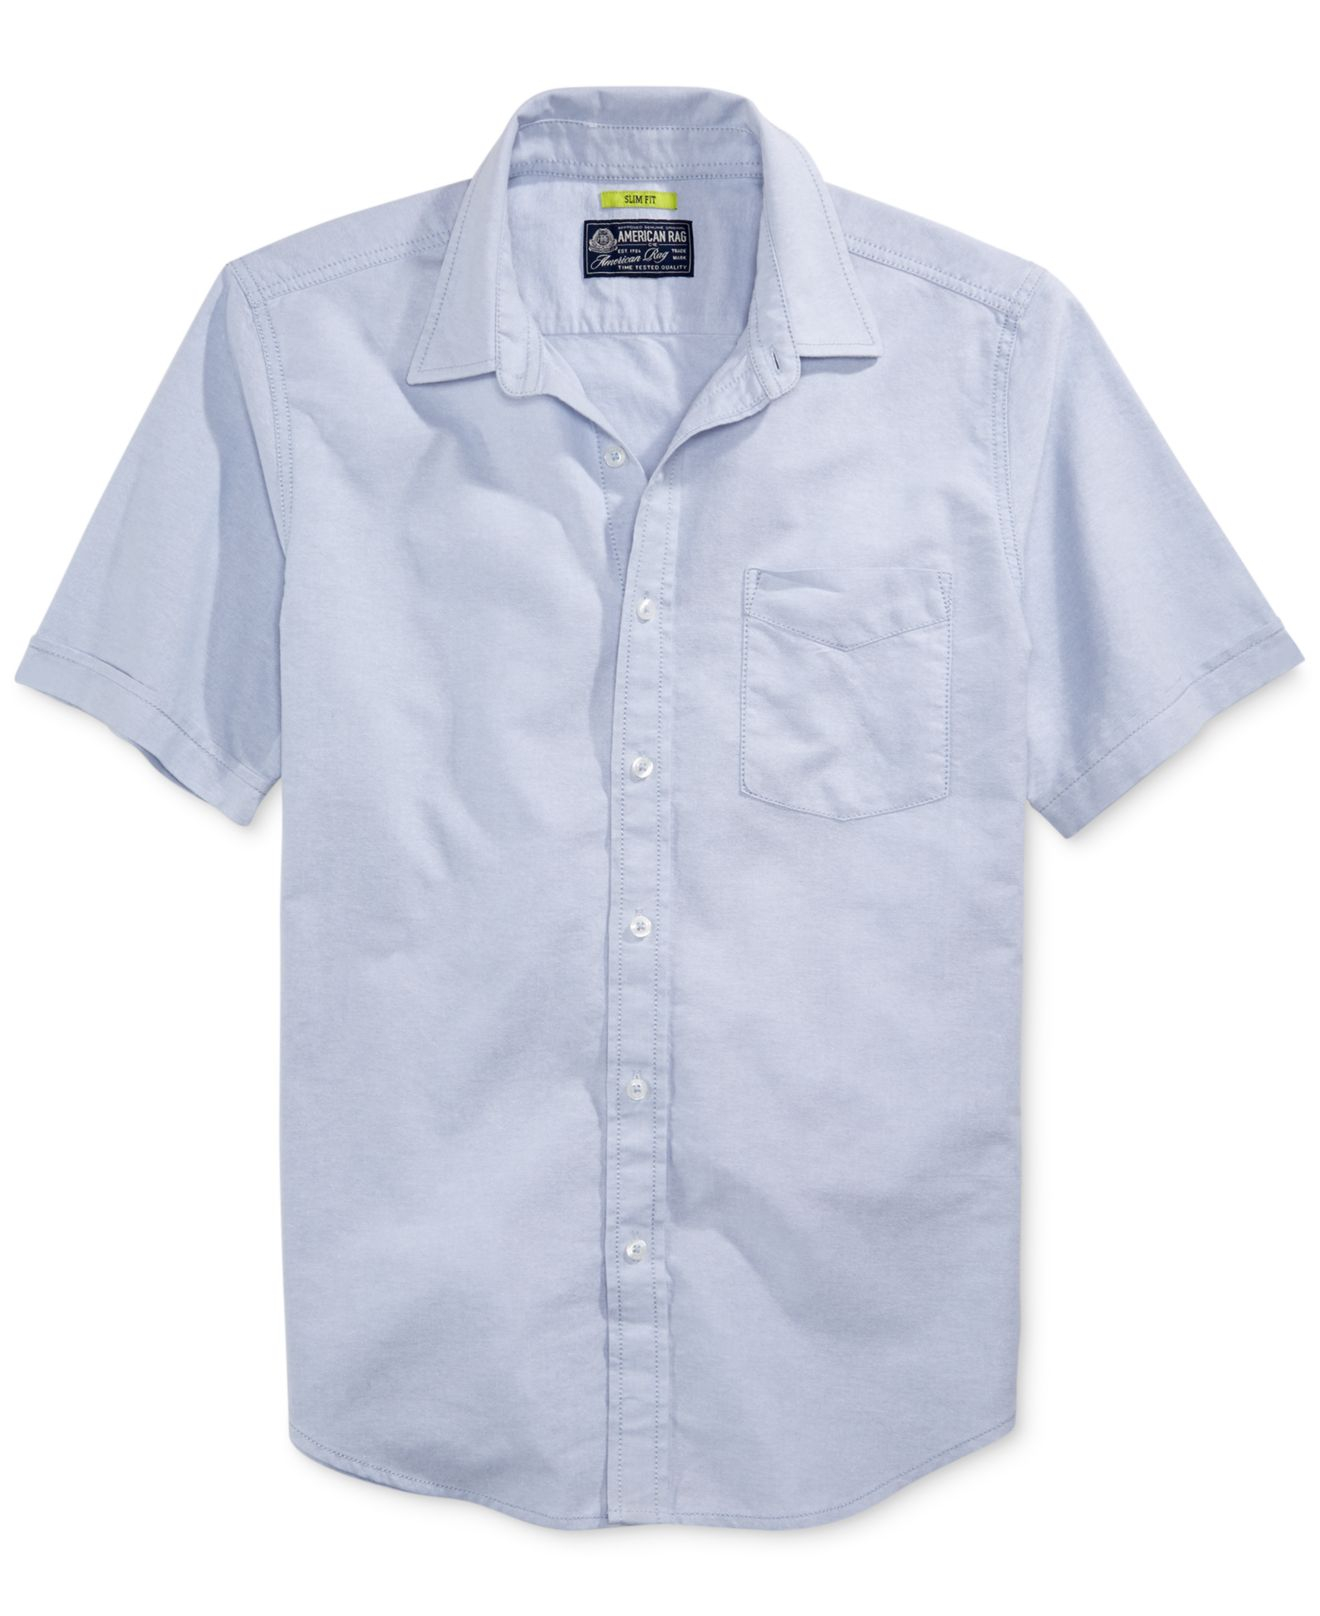 Lyst American Rag Solid Slimfit Oxford Shirt In Blue For Men